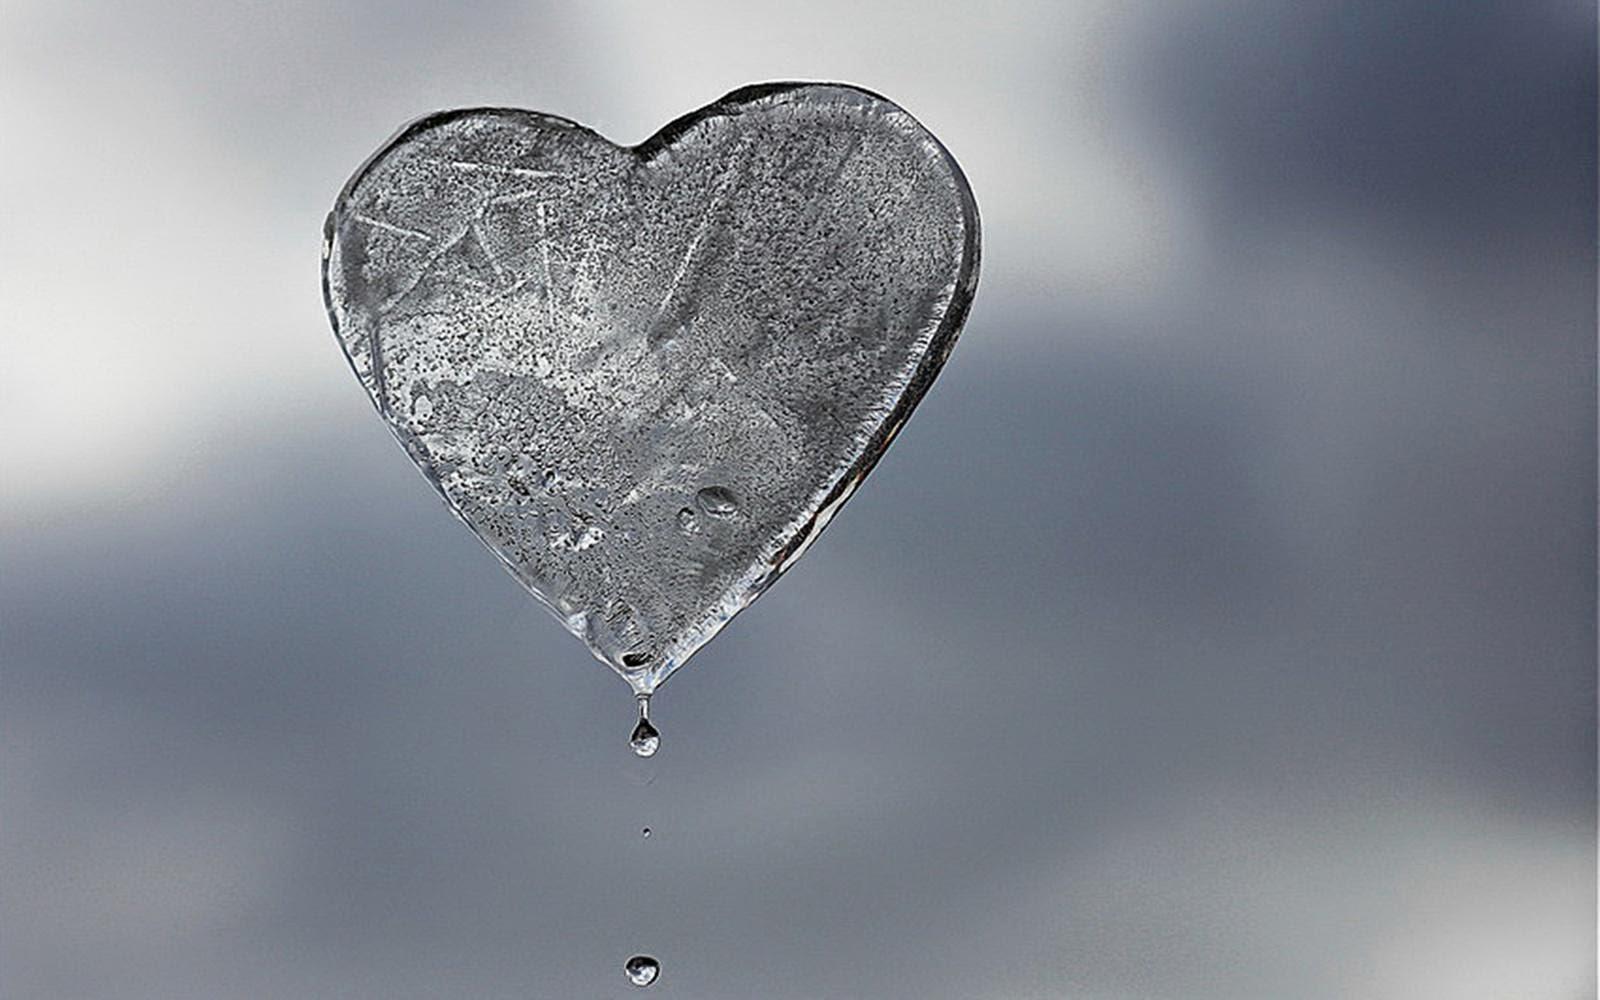 Ice cold heart - Album on Imgur